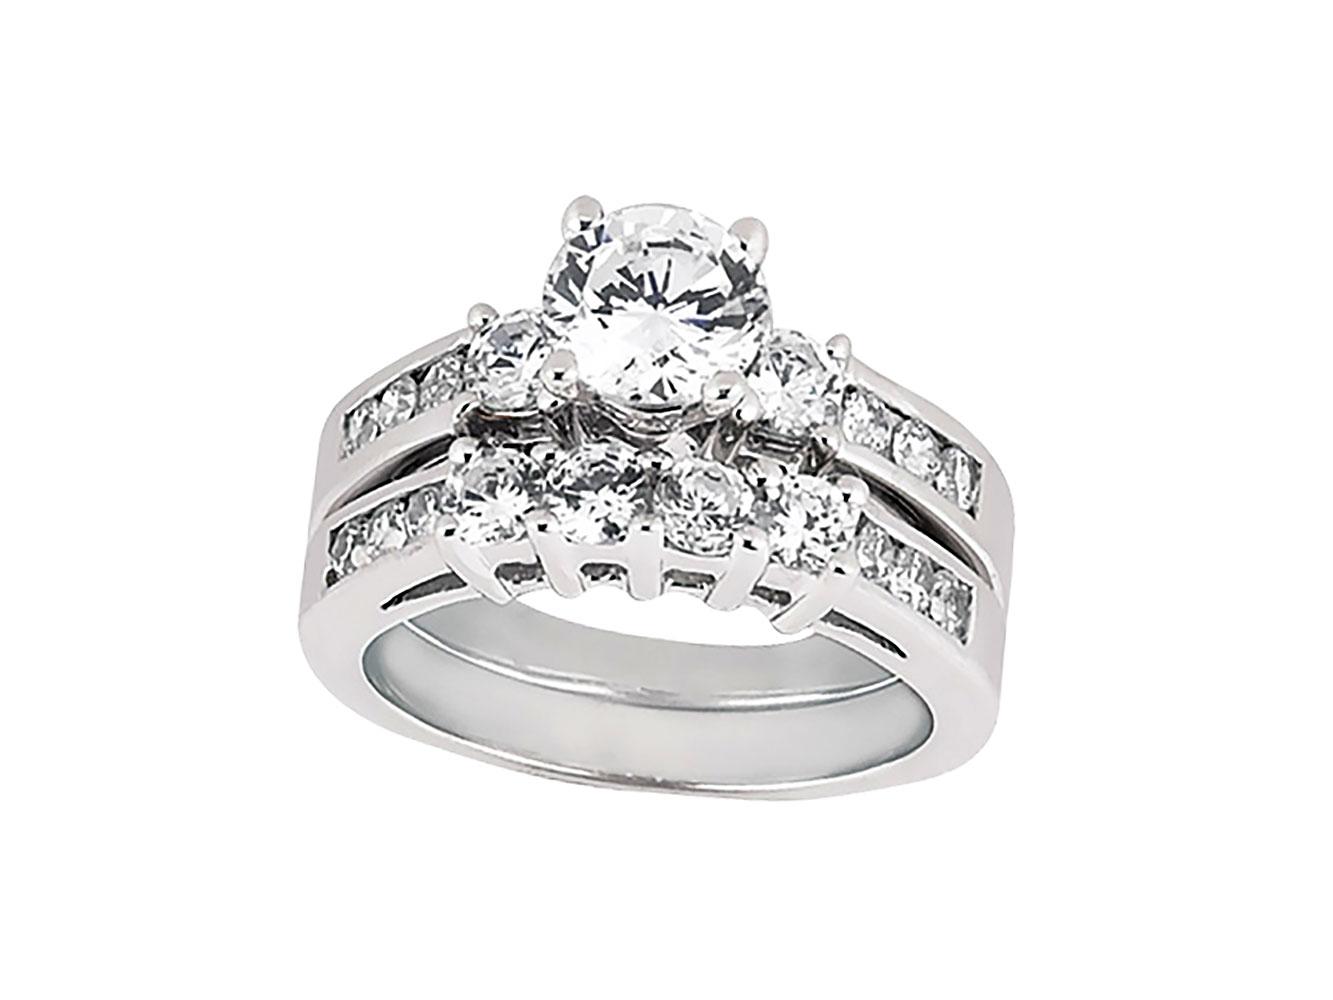 2Carat Round Cut Diamond Engagement Ring Wedding Band